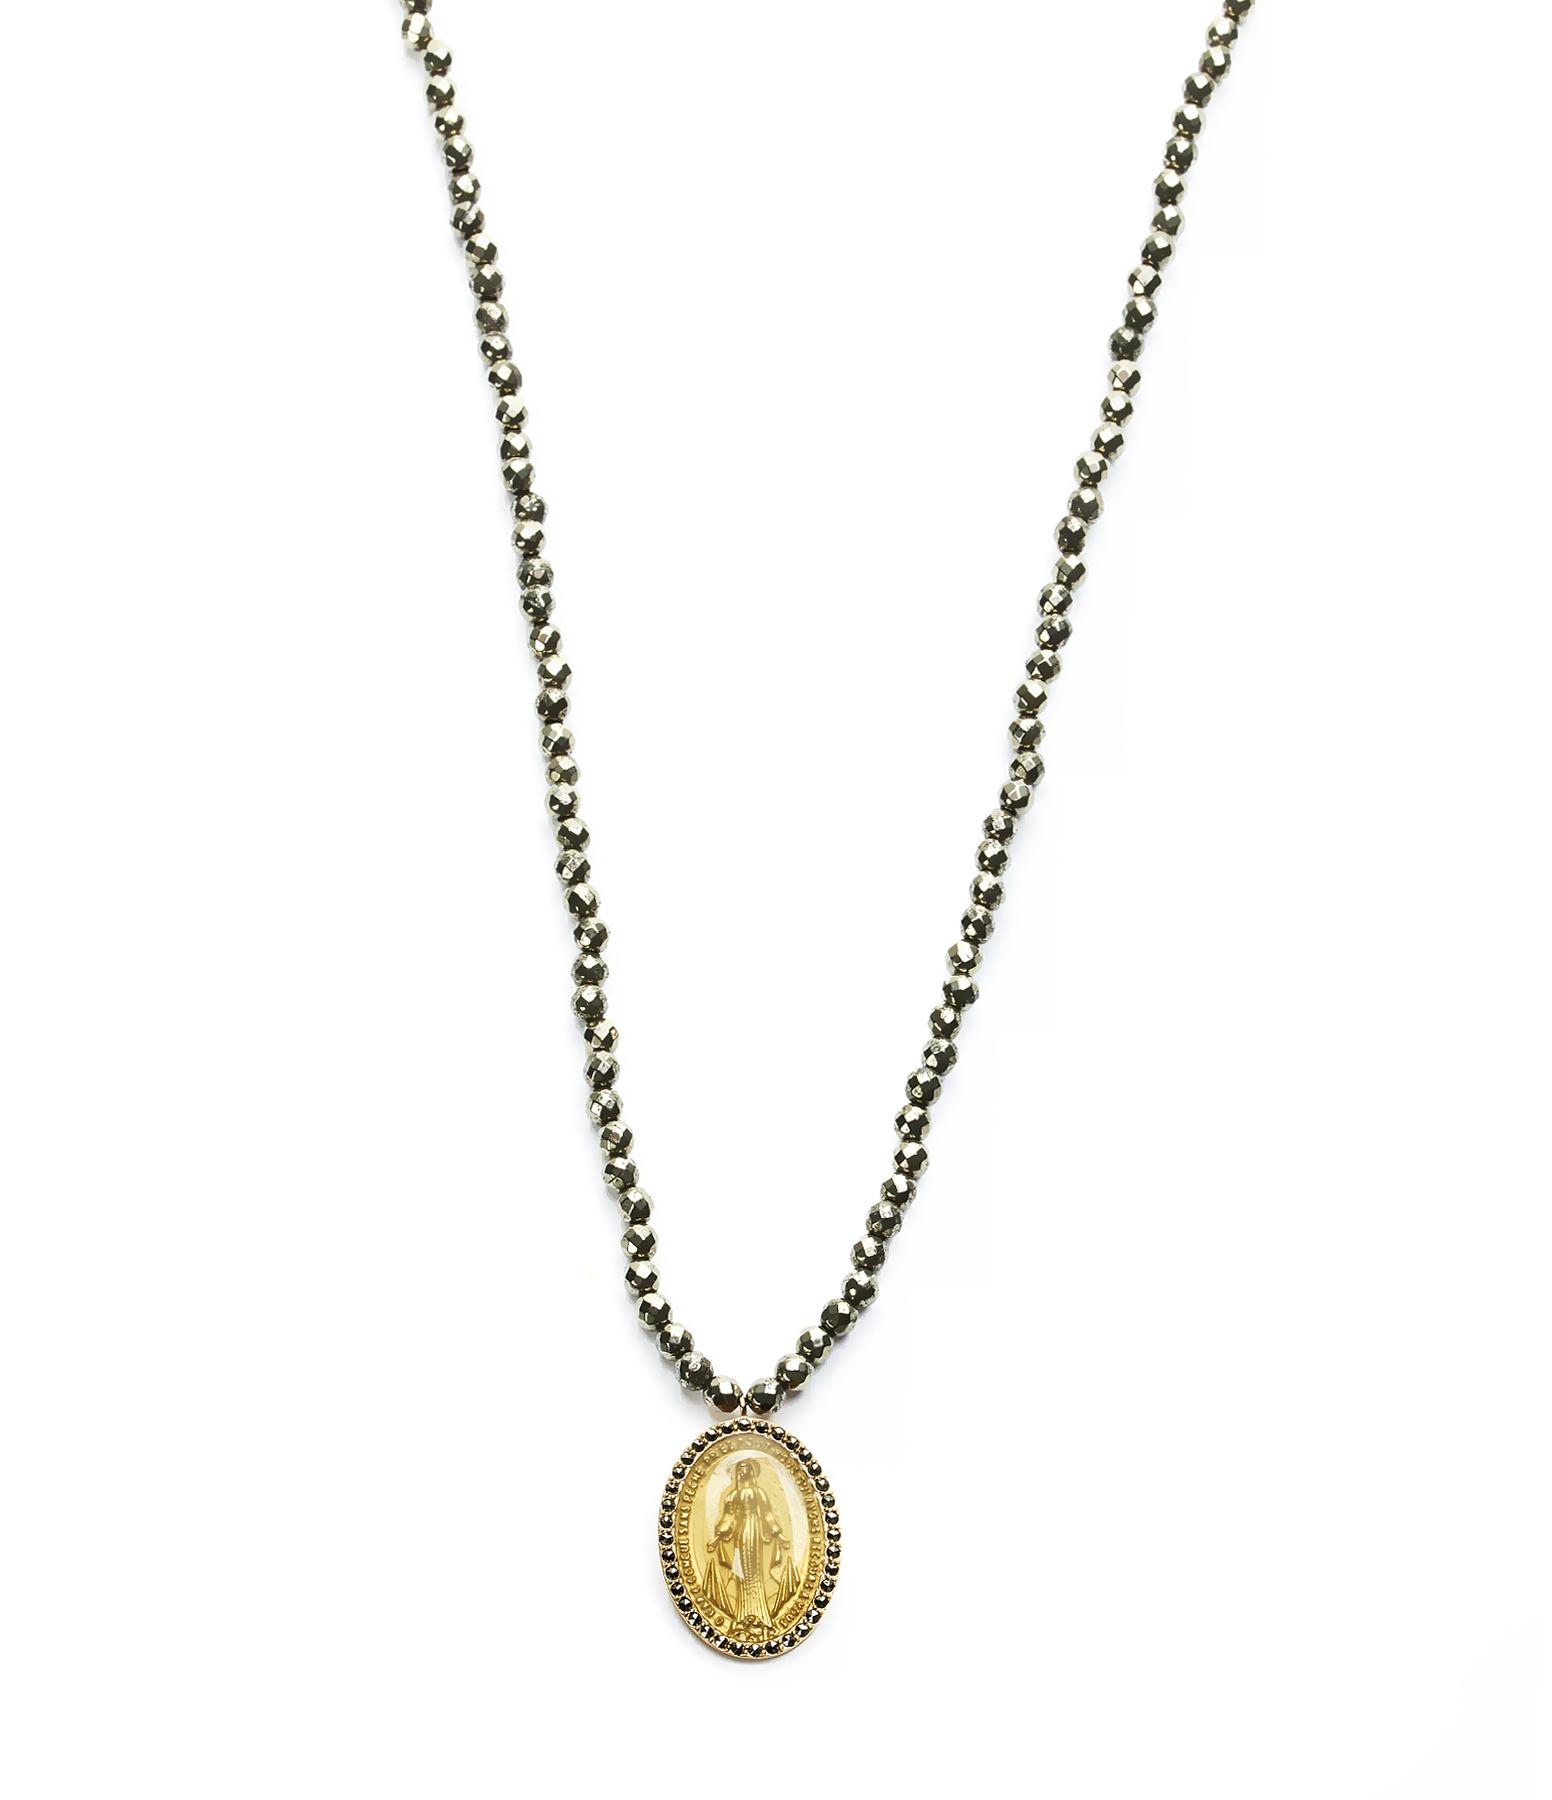 Collier Médaille Madone Ovale Marcassites 9K